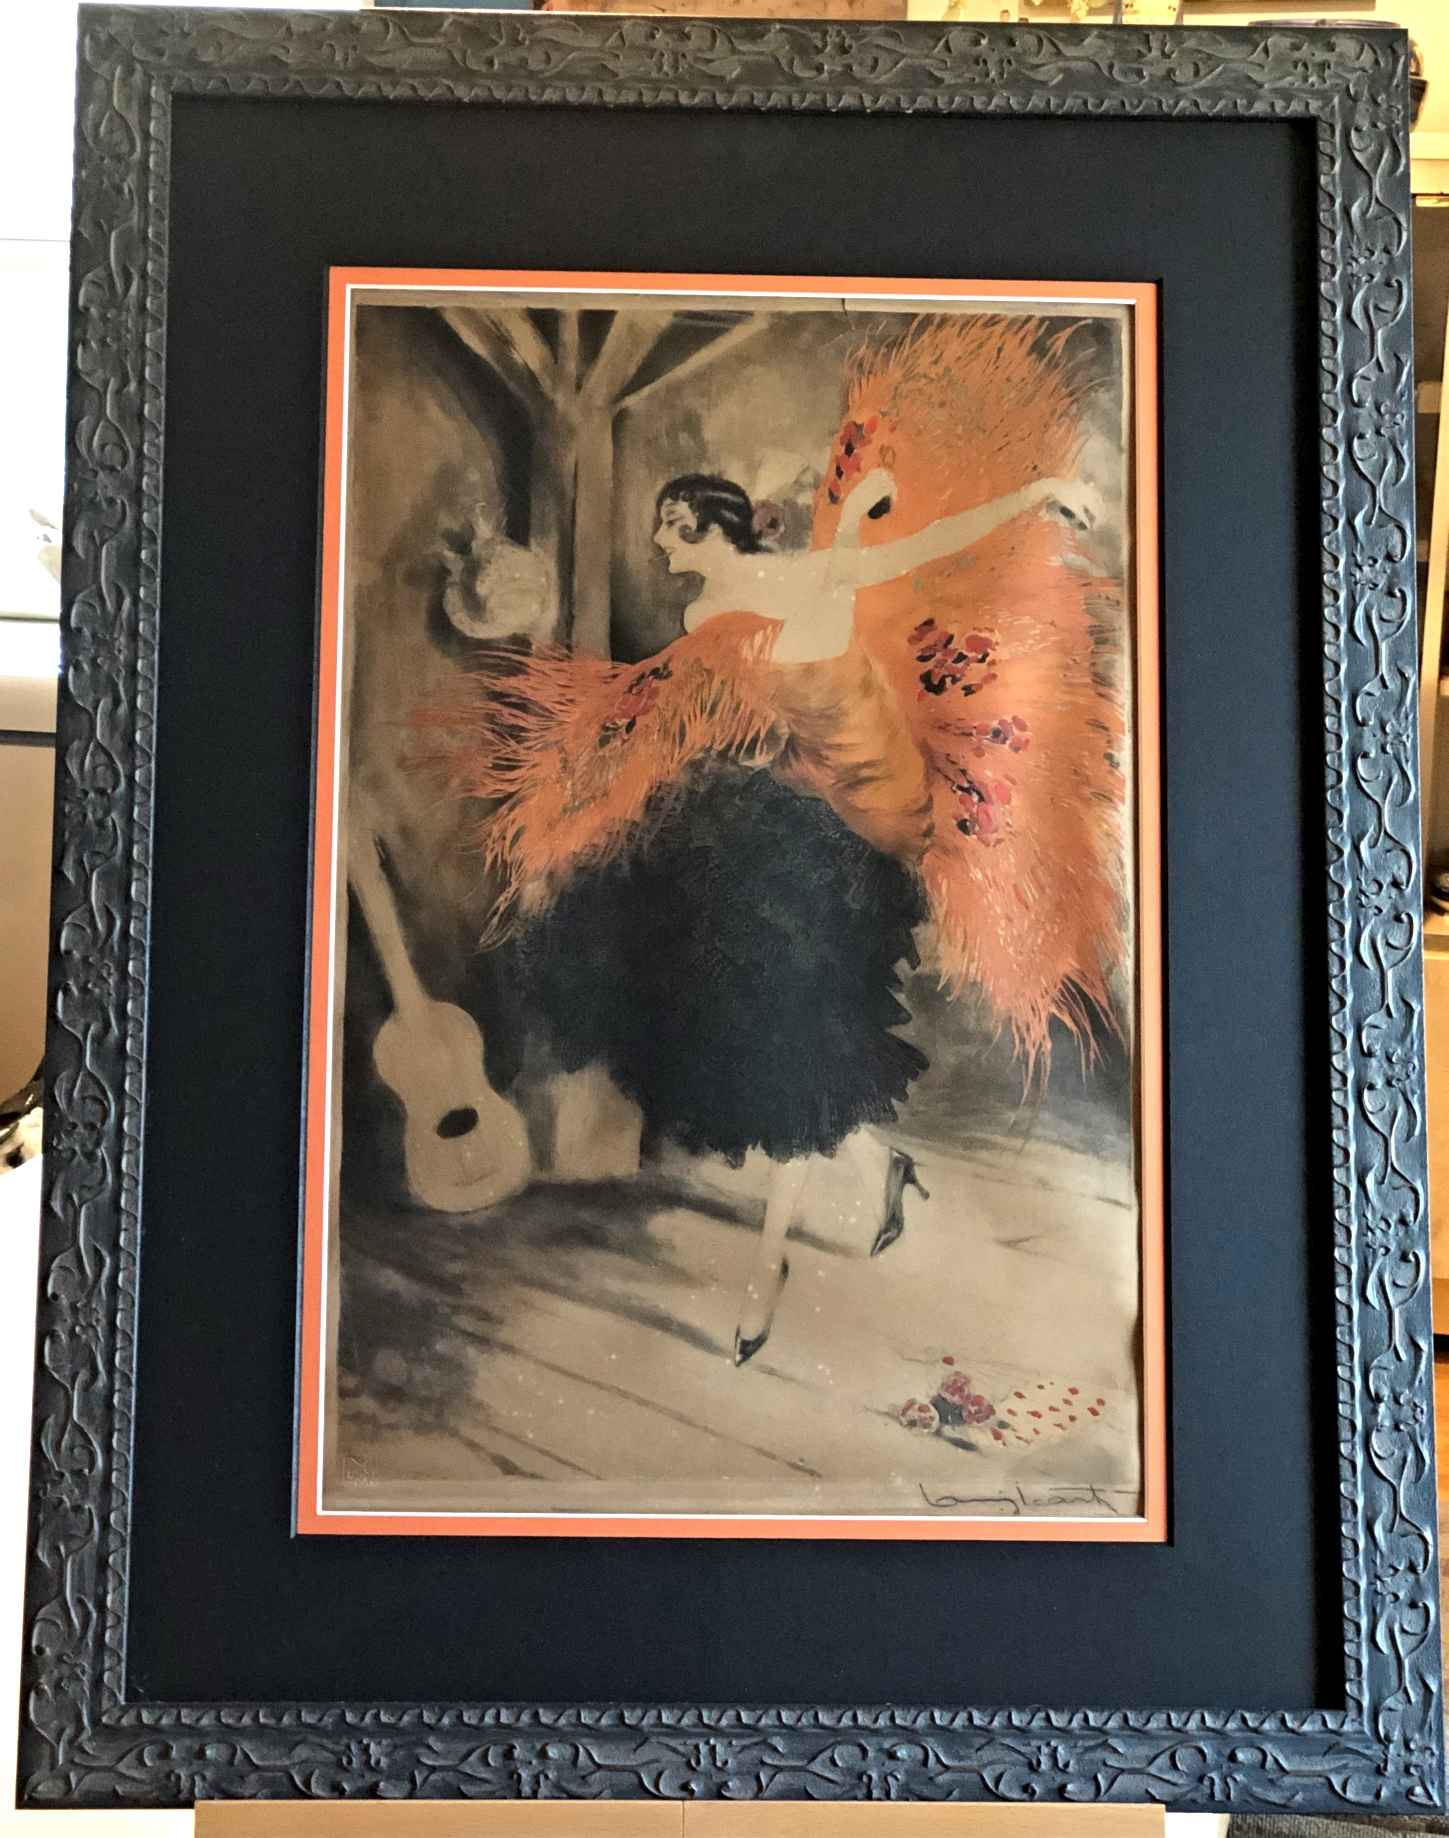 Spanish Dancer by  Louis Icart - Masterpiece Online